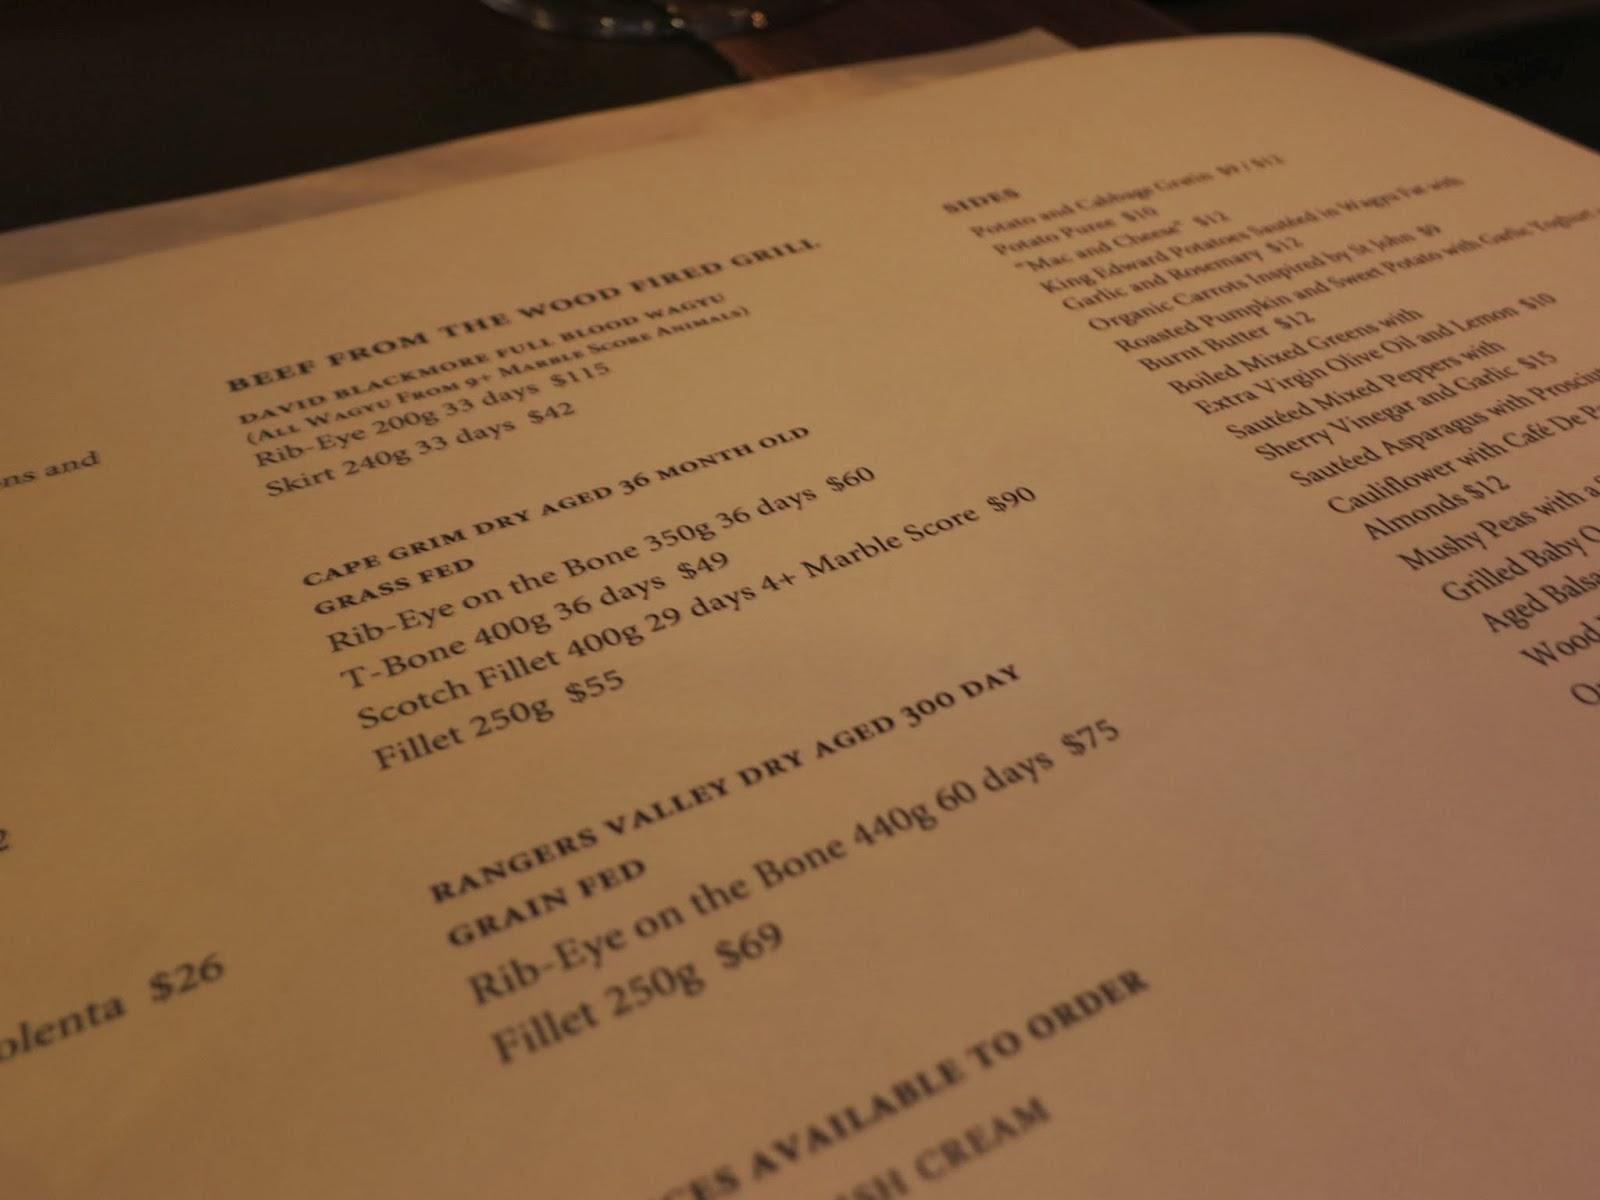 Fatboy S Kitchen And Bar Menu